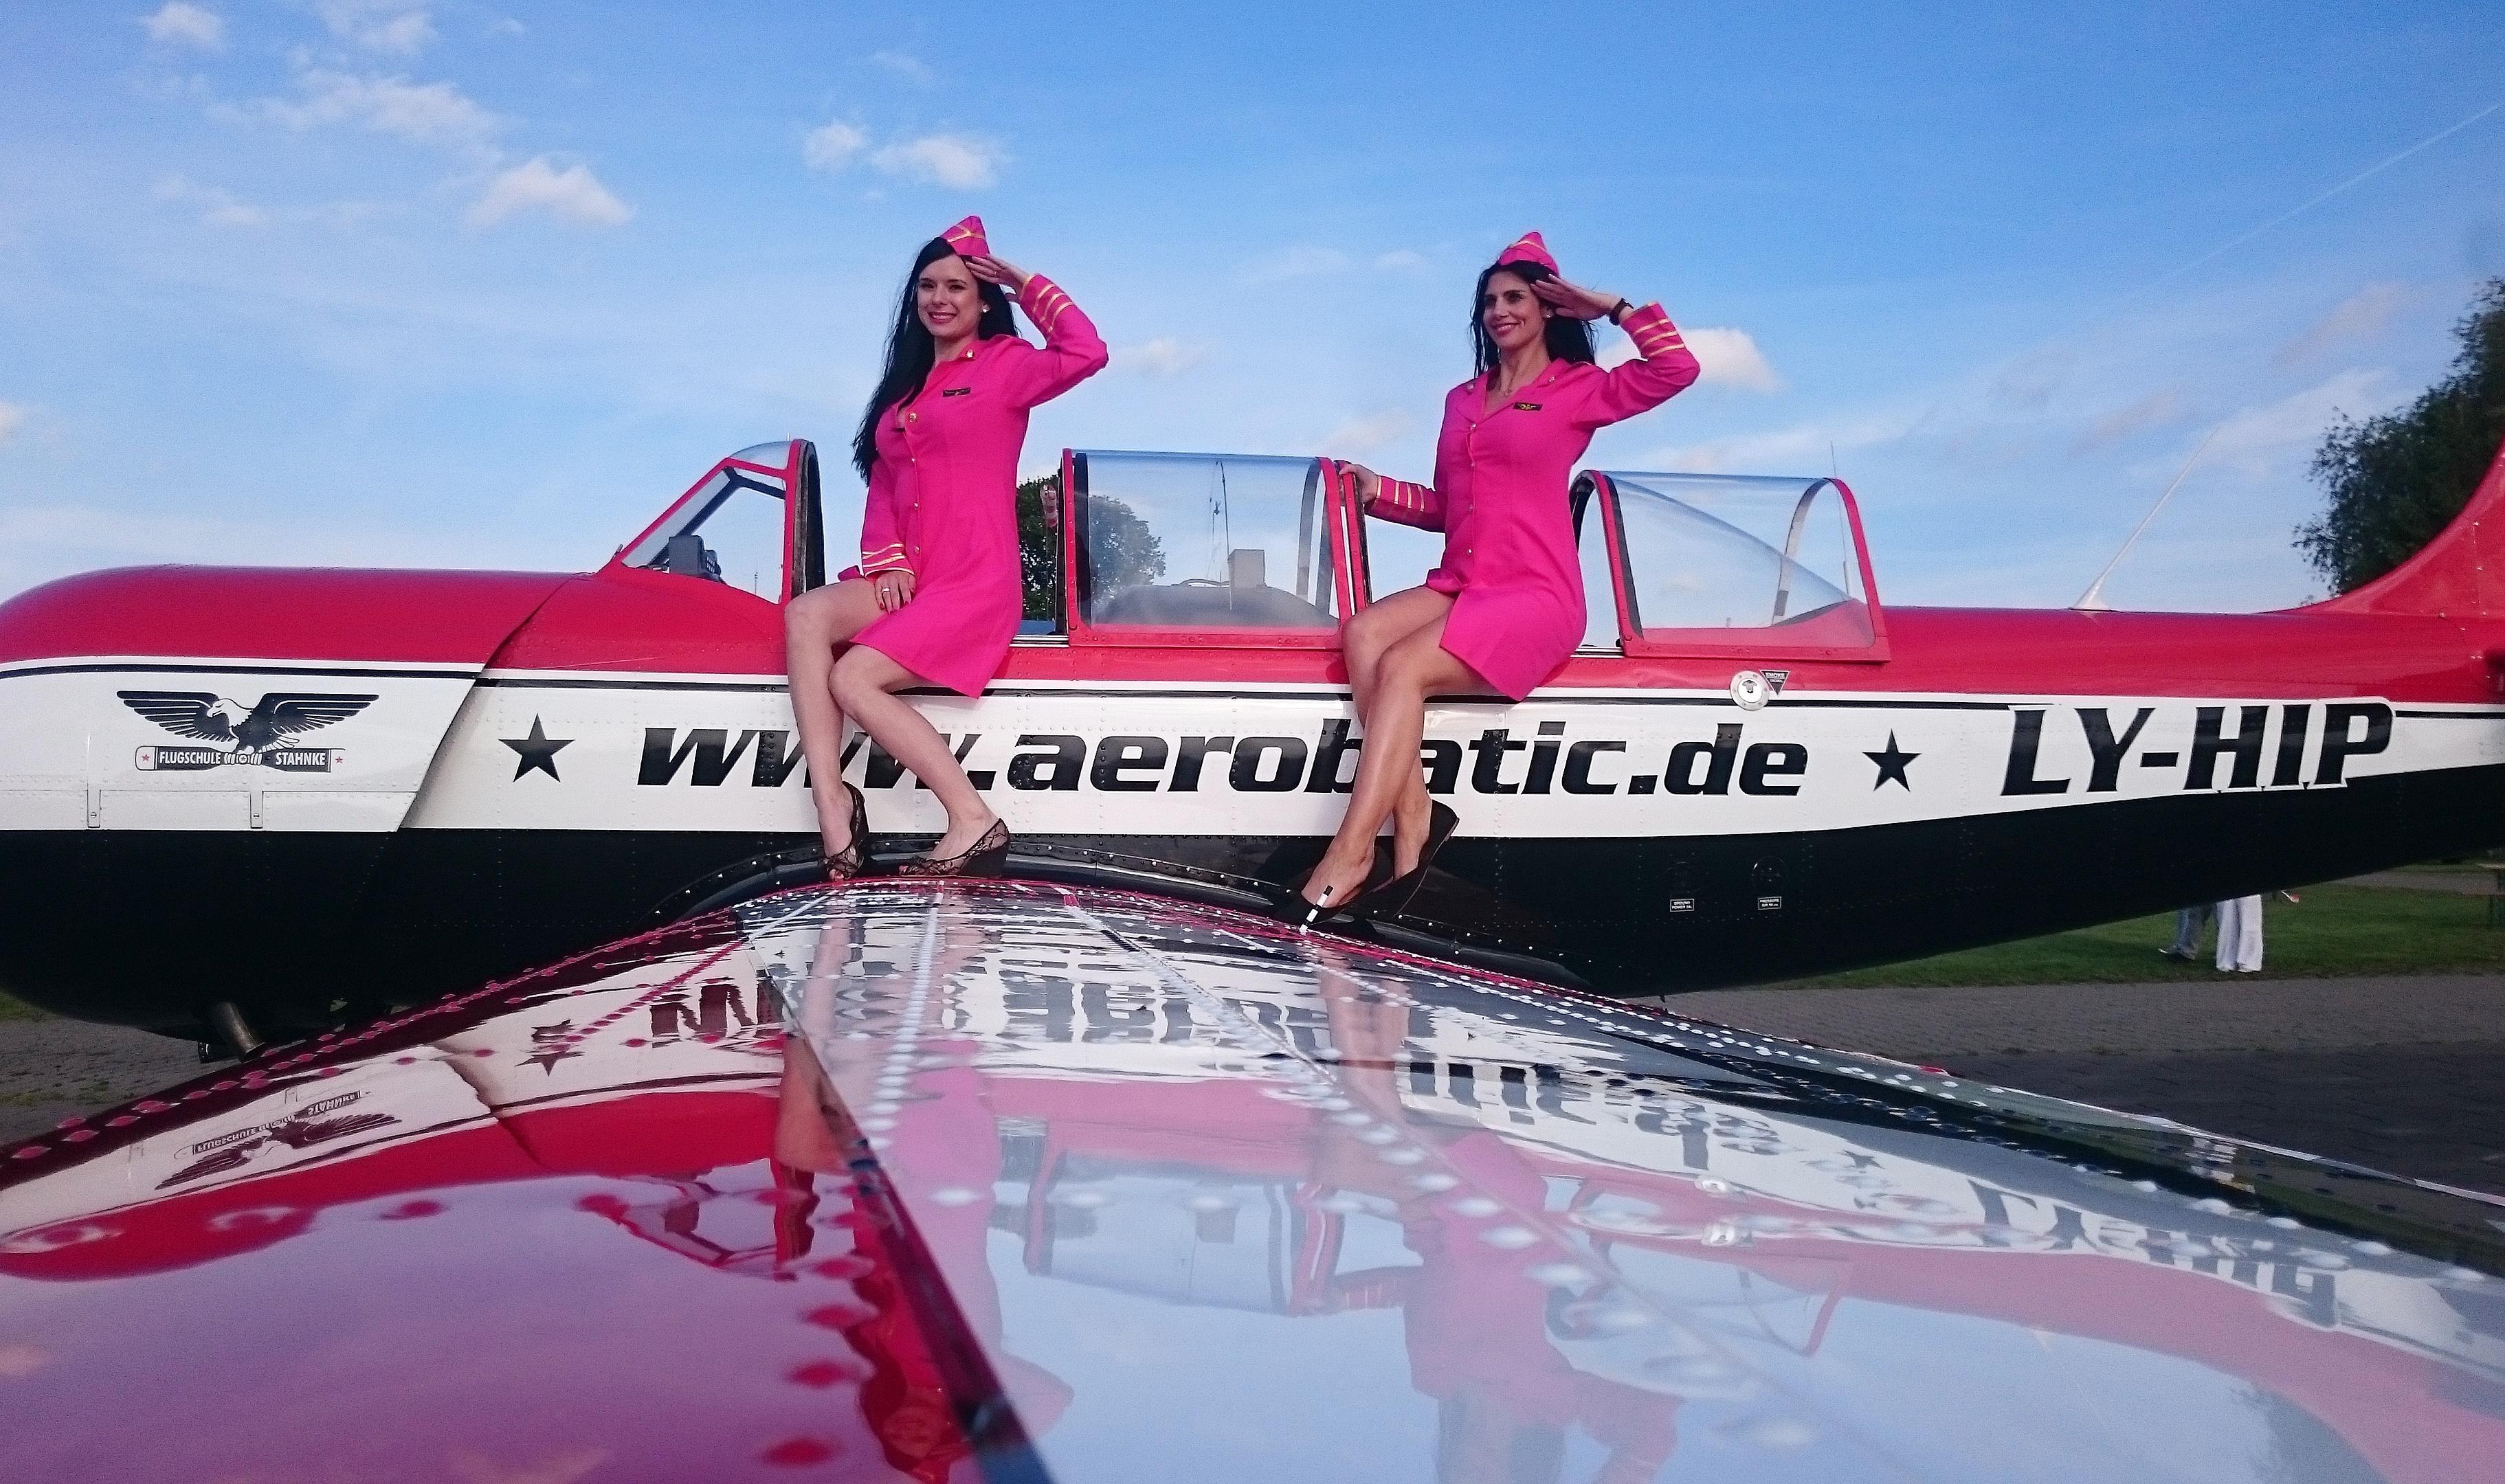 flugtag ballenstedt-promotion girl girls bensch media gridgirls umbrellagirls casting bewerbung agentur hostessen messe outfits event models team